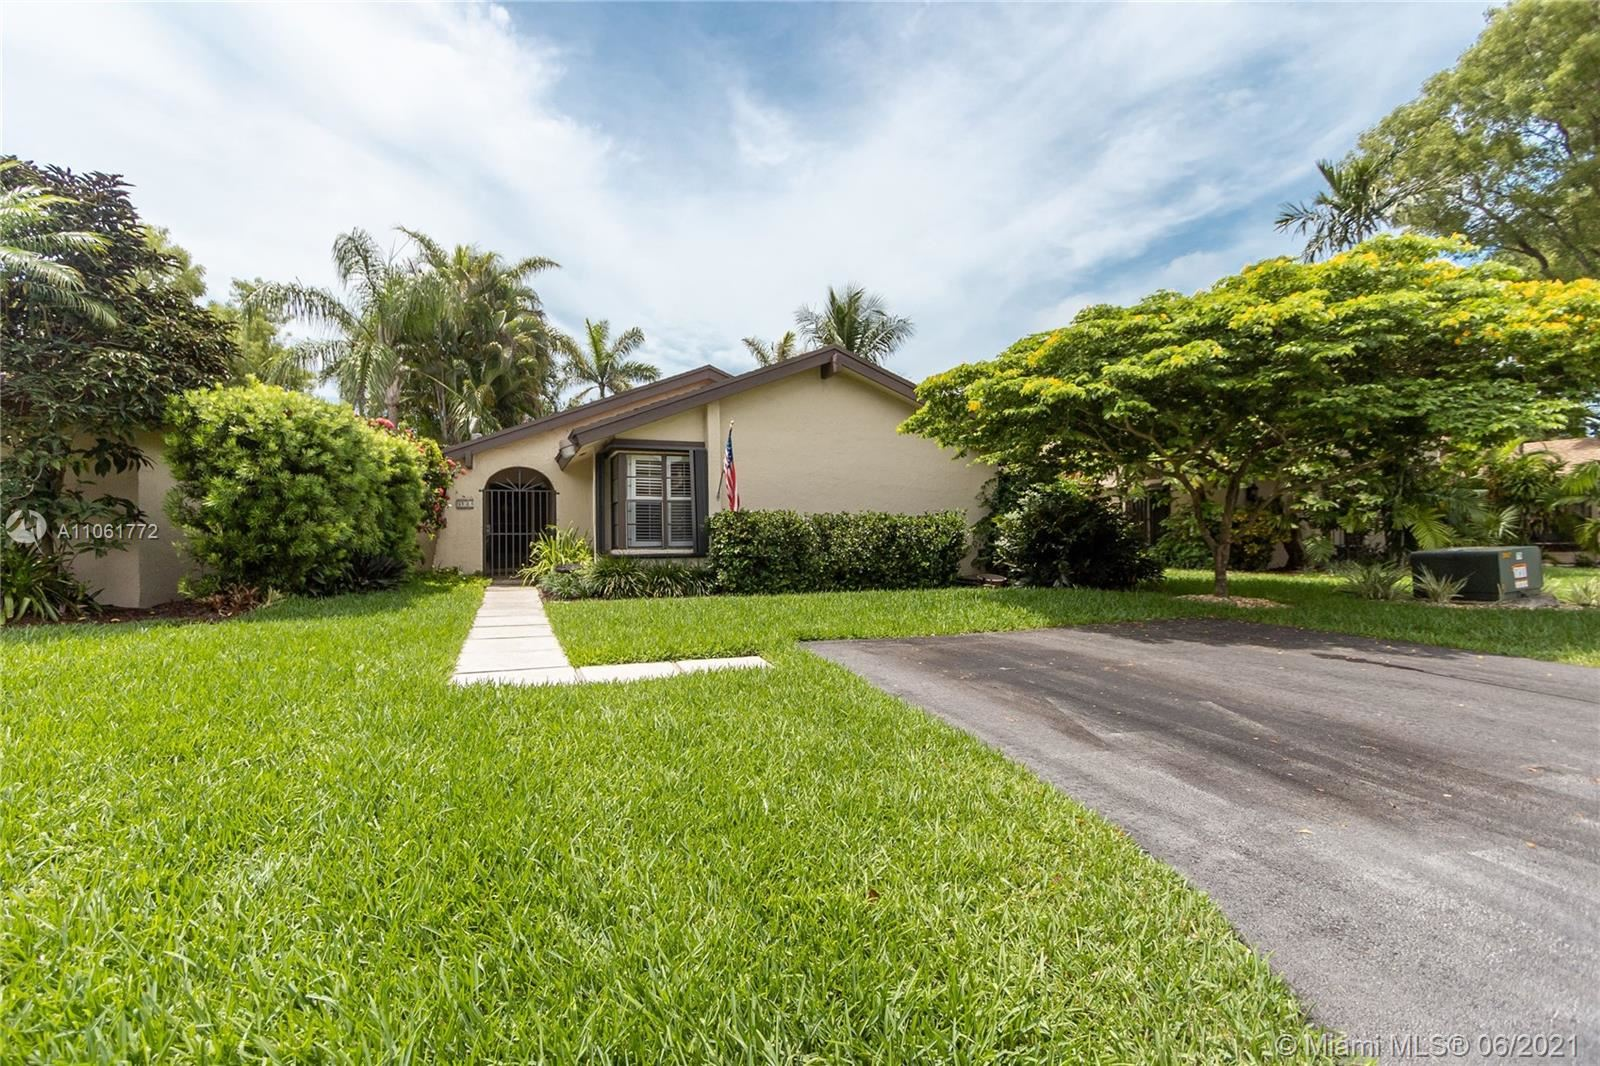 9144 SW 132nd Ln, Miami, FL 33176 - #: A11061772